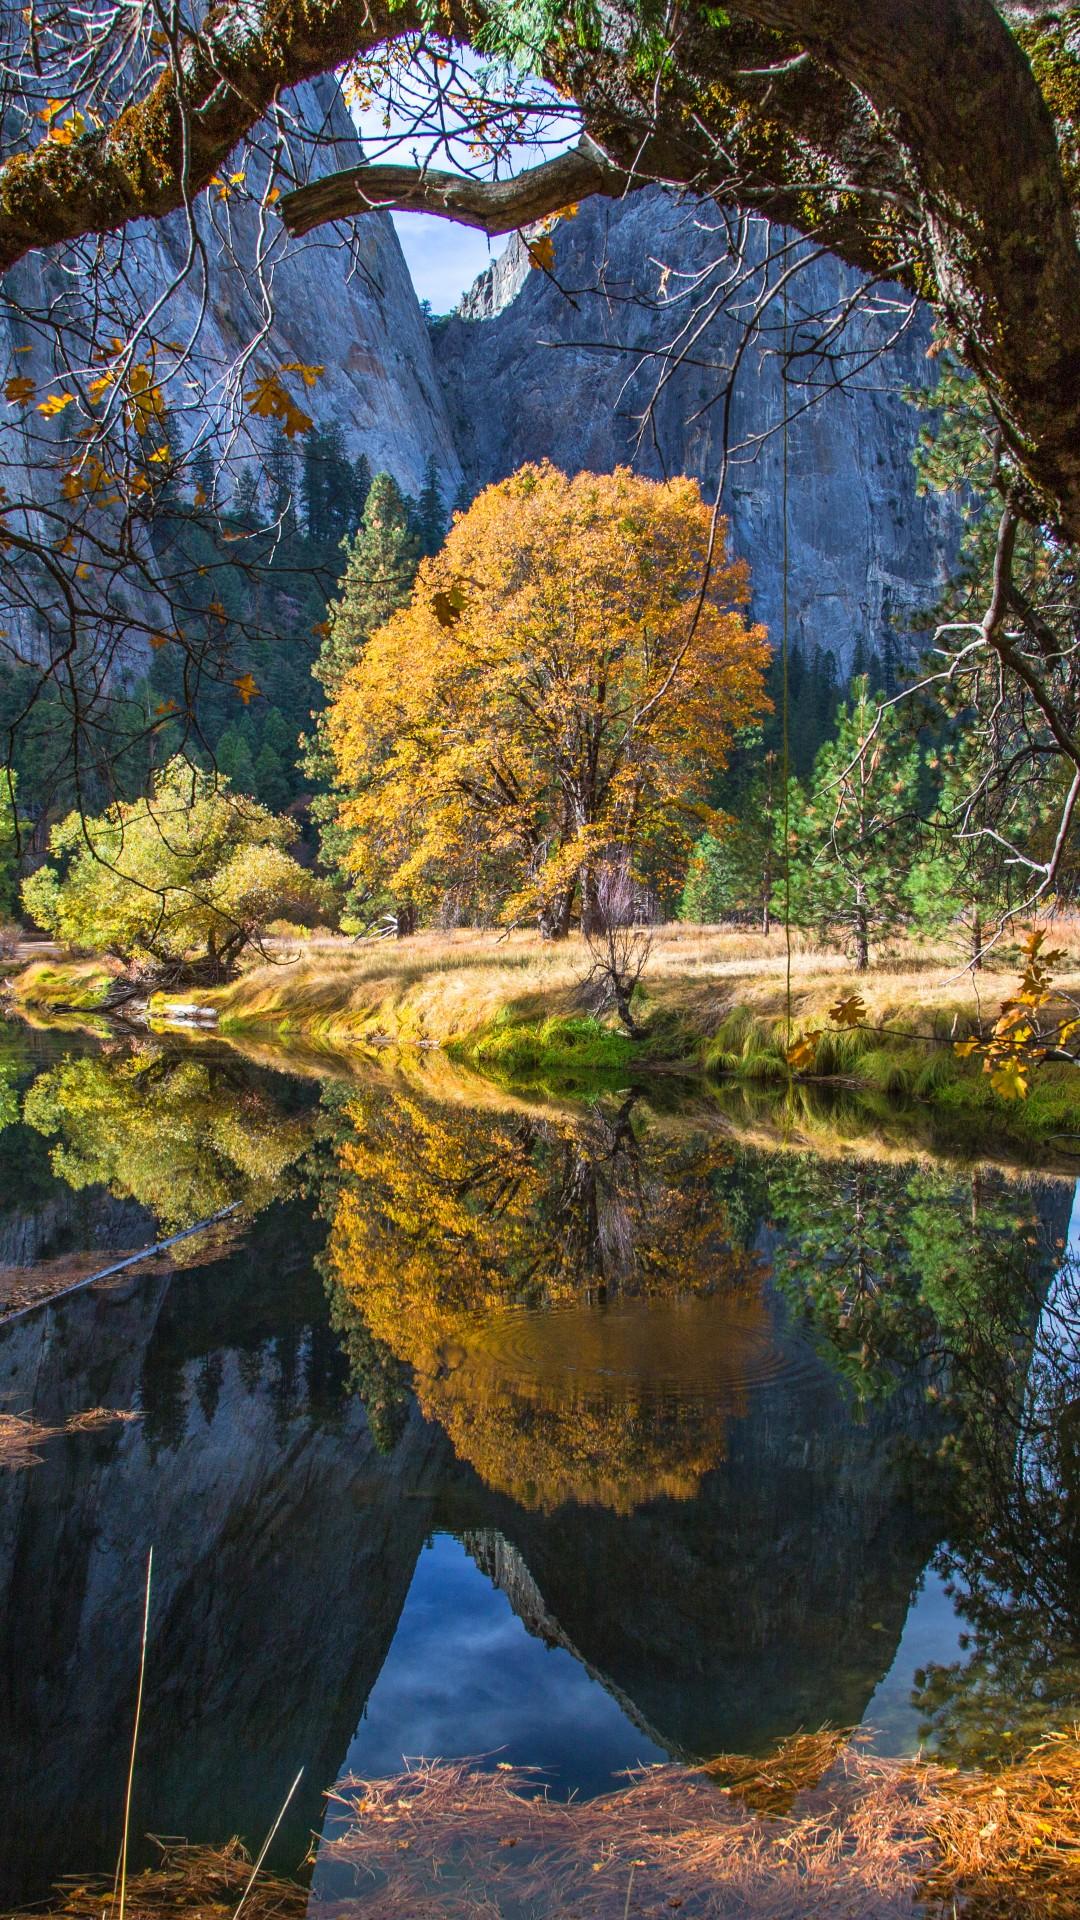 California Girls Facebook Wallpaper Wallpaper Yosemite 5k 4k Wallpaper 8k Forest Osx